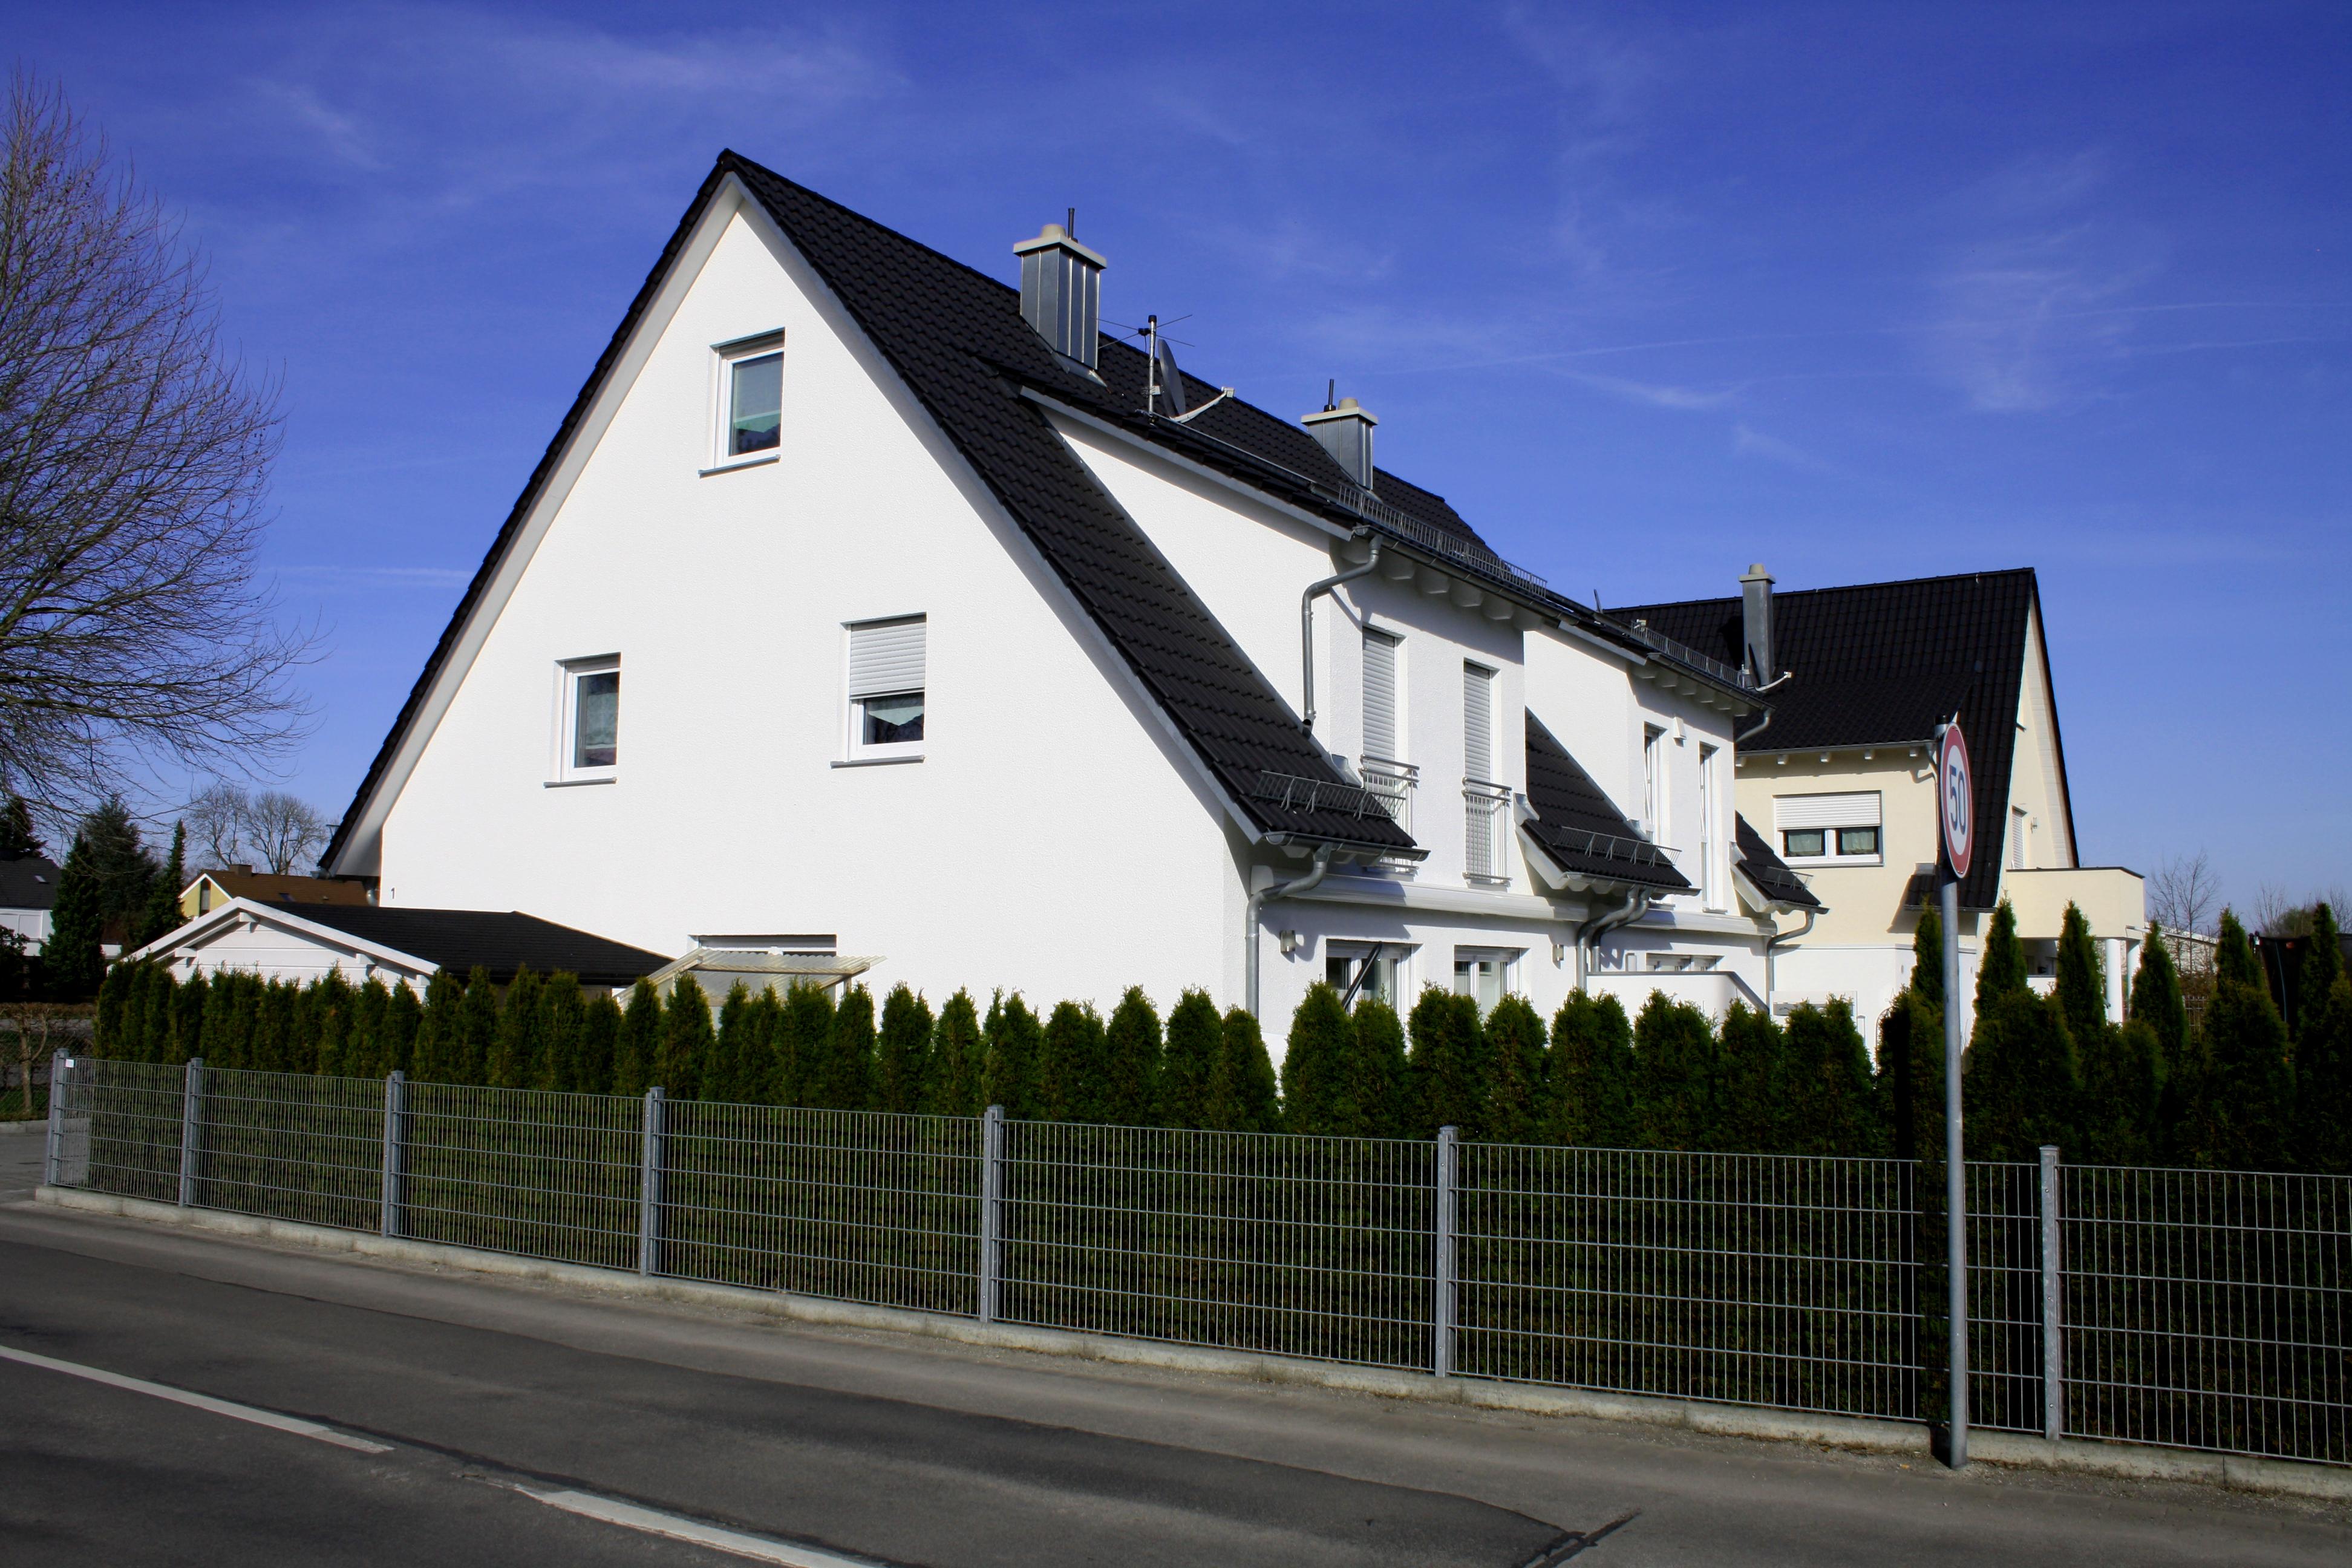 Mathias-Wahl-Straße1